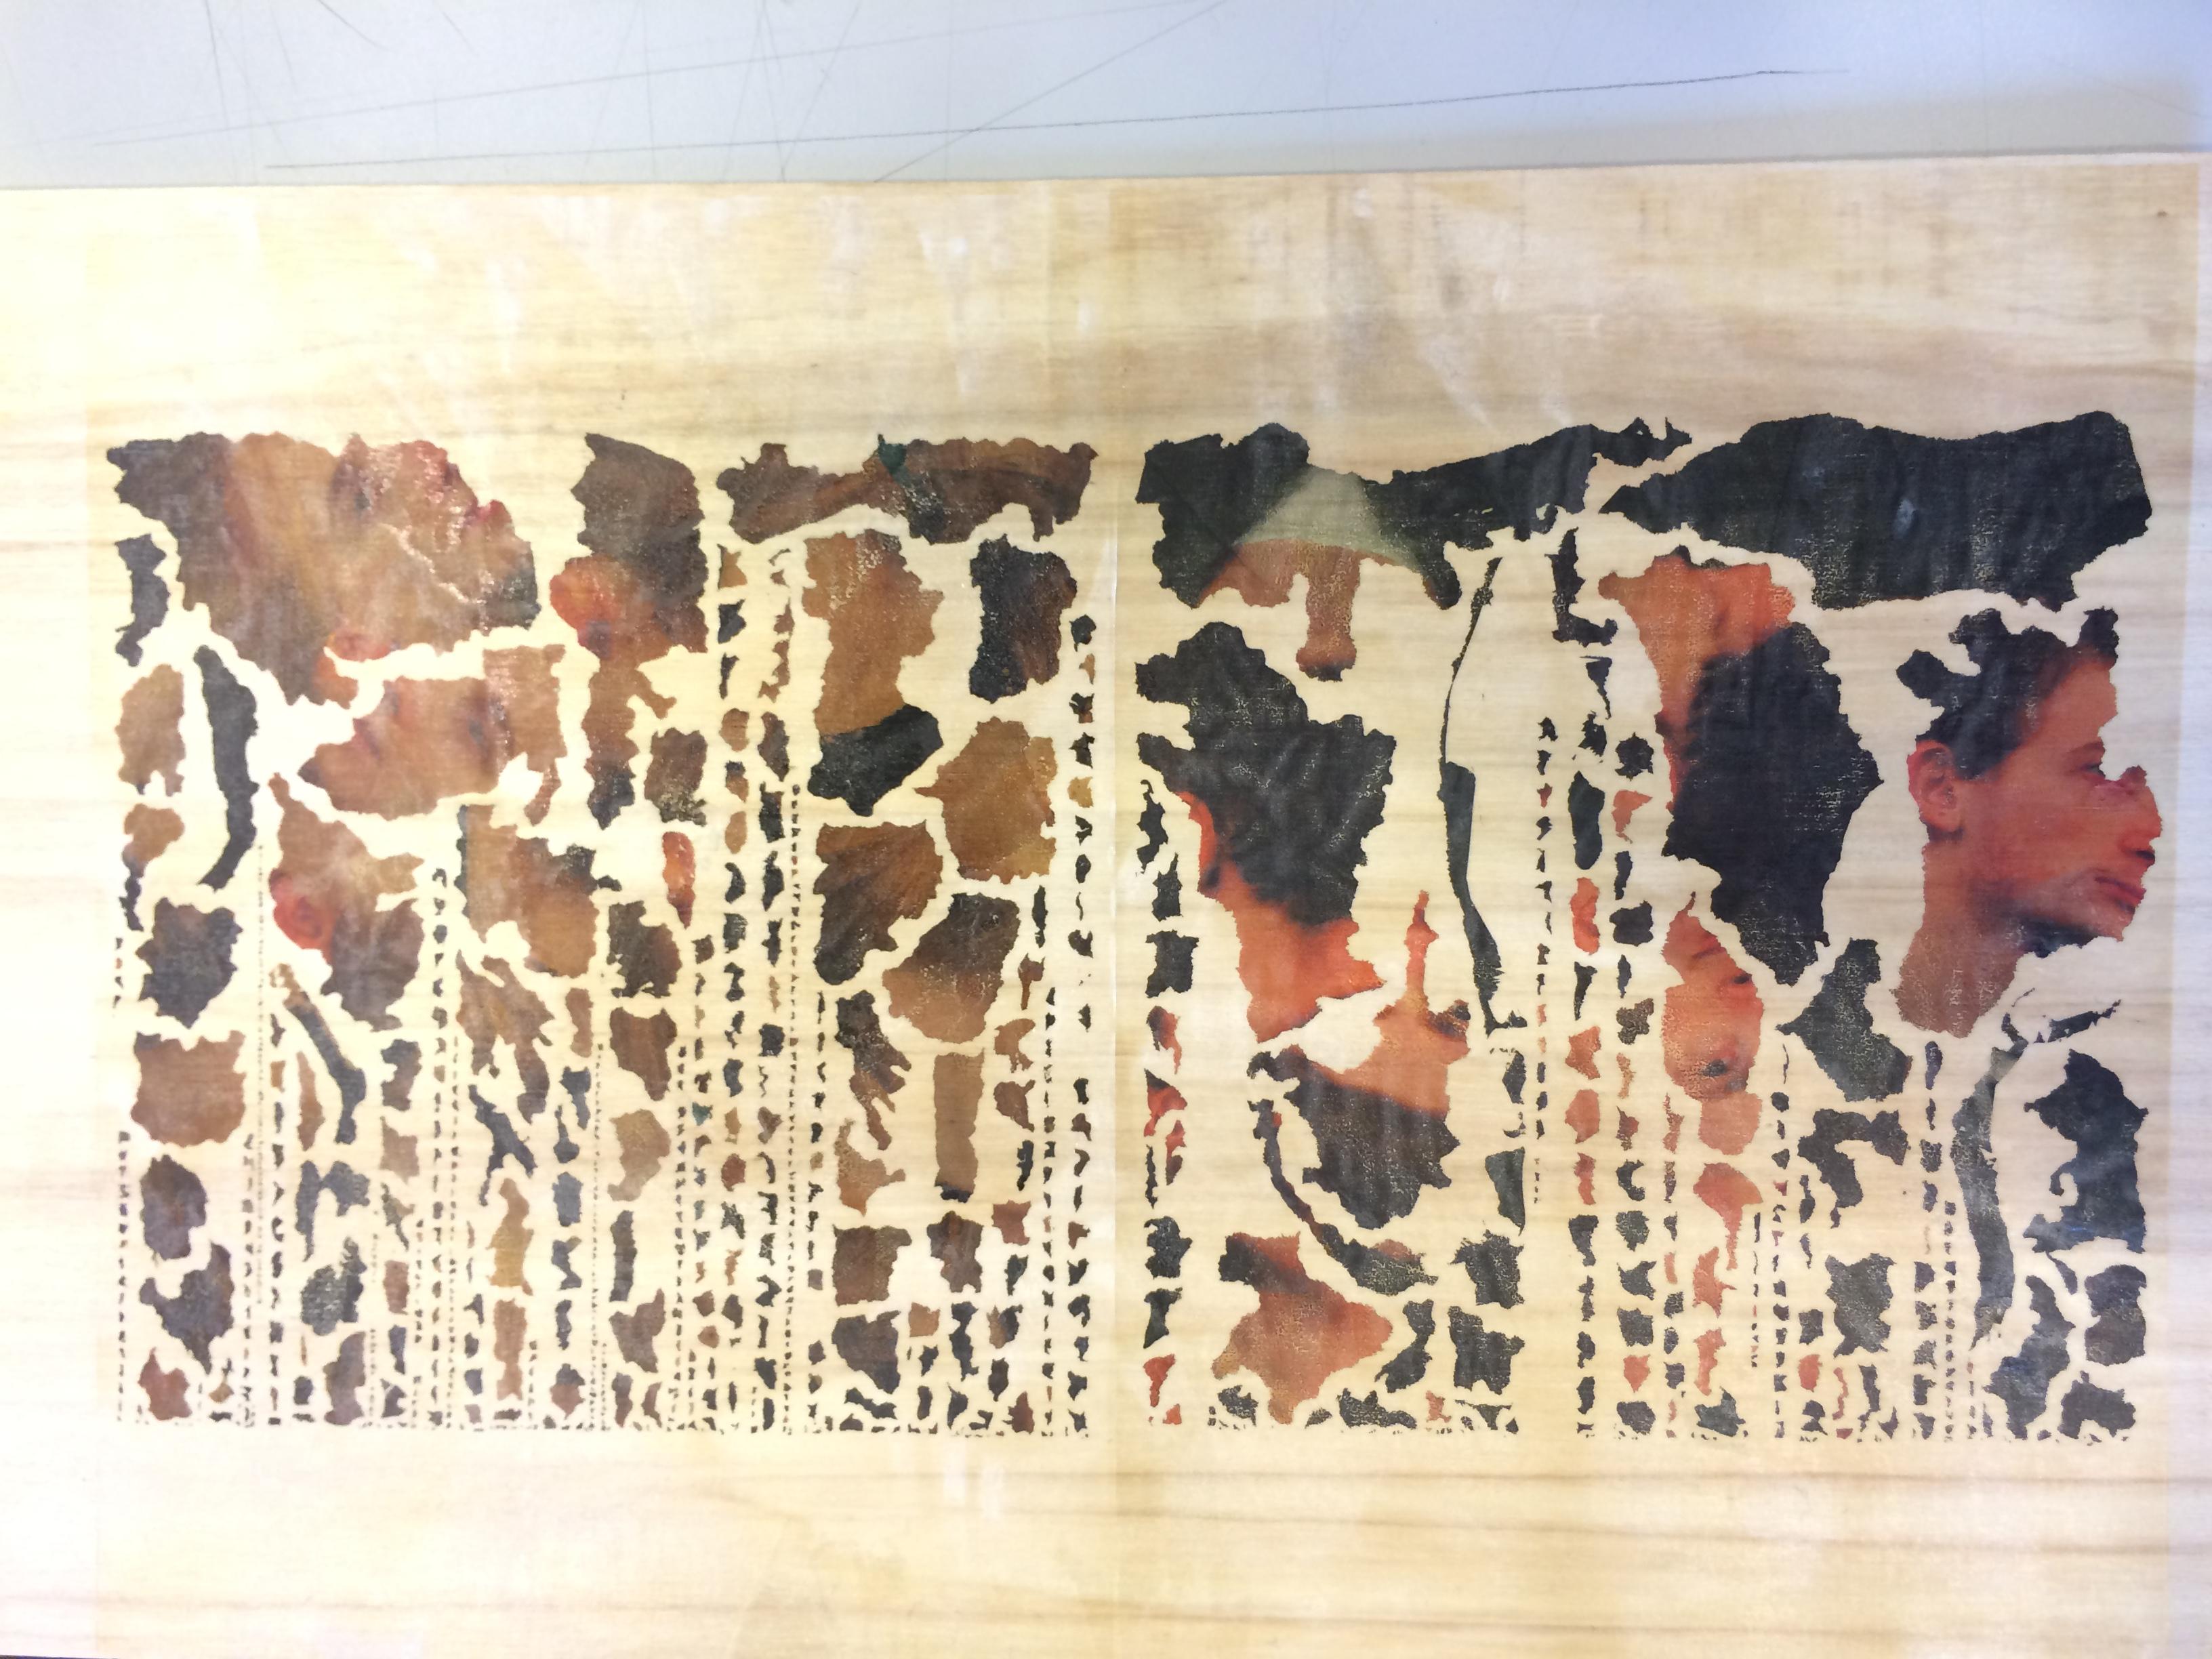 transfert photo sur bois r form digit. Black Bedroom Furniture Sets. Home Design Ideas